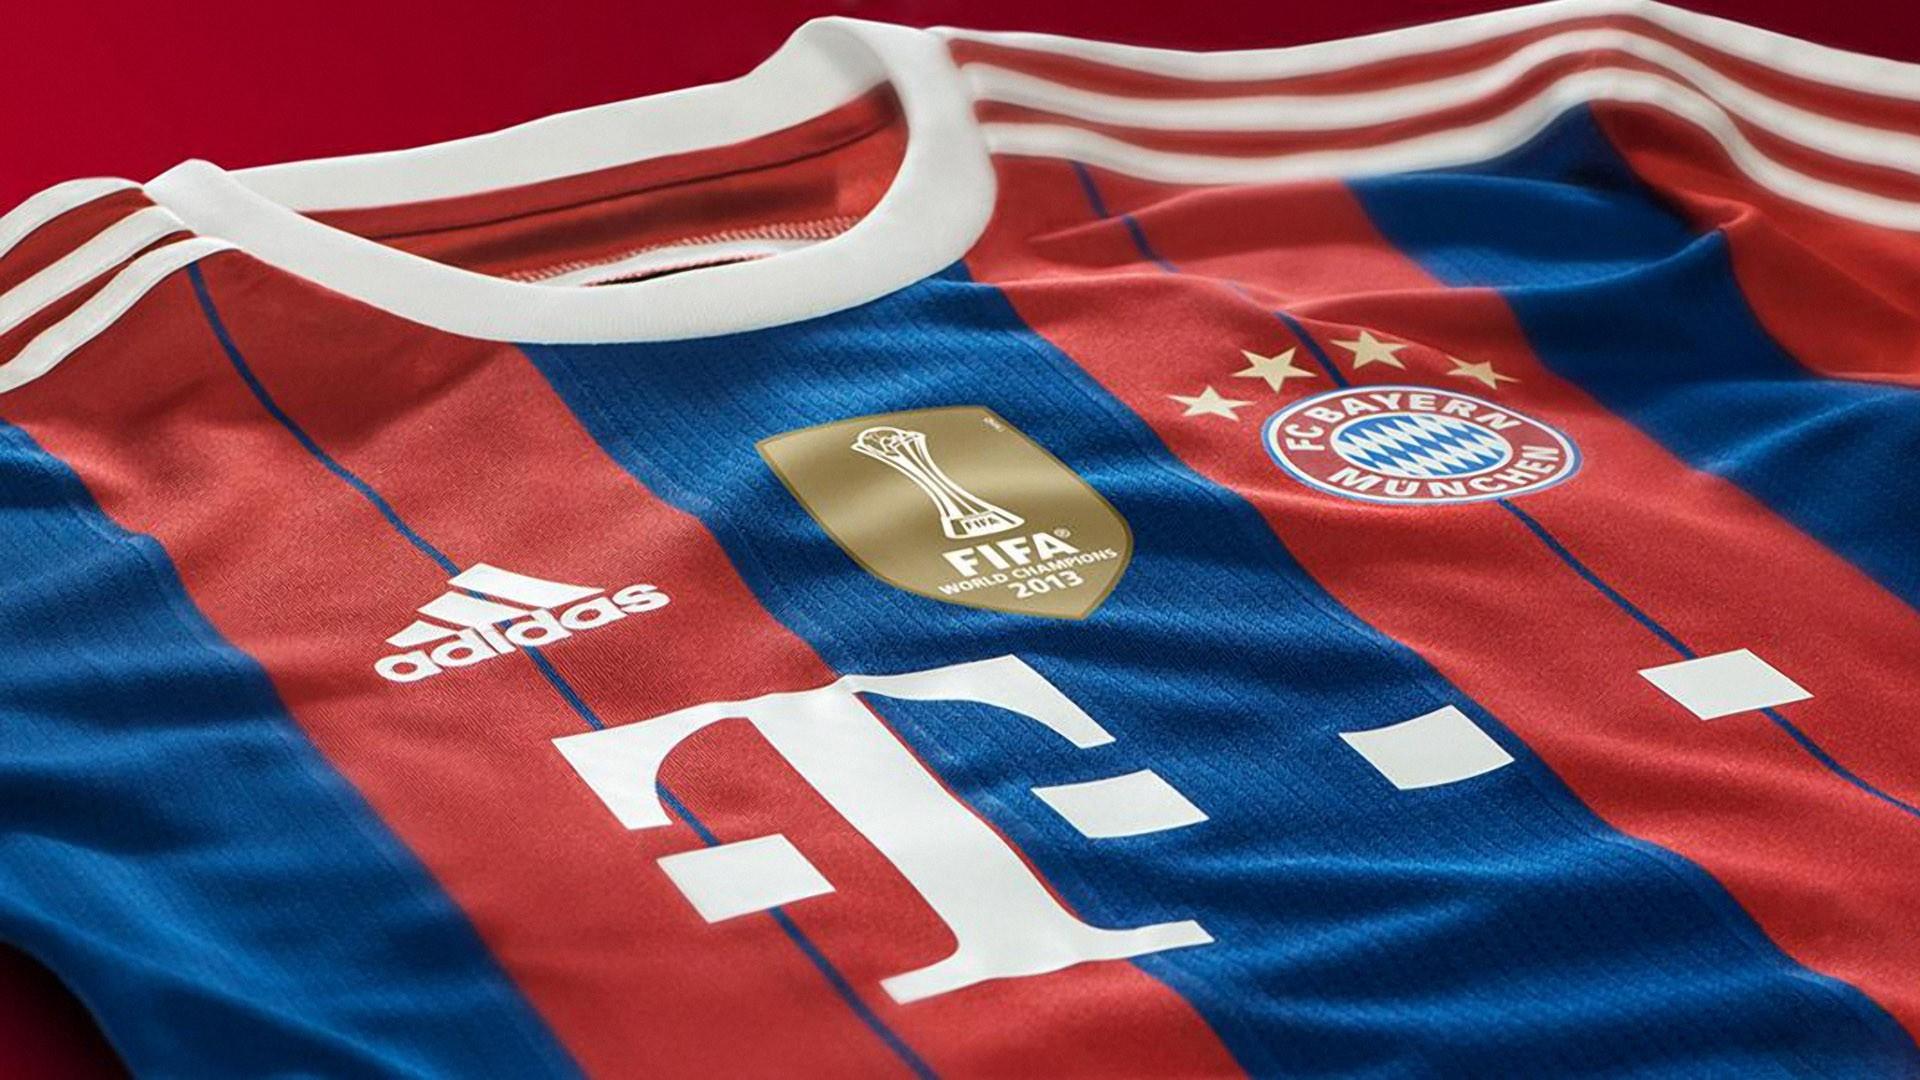 Fc Bayern Munich HD Wallpapers Wallpaper 1600×1000 Bayern Munich Wallpaper  (40 Wallpapers)